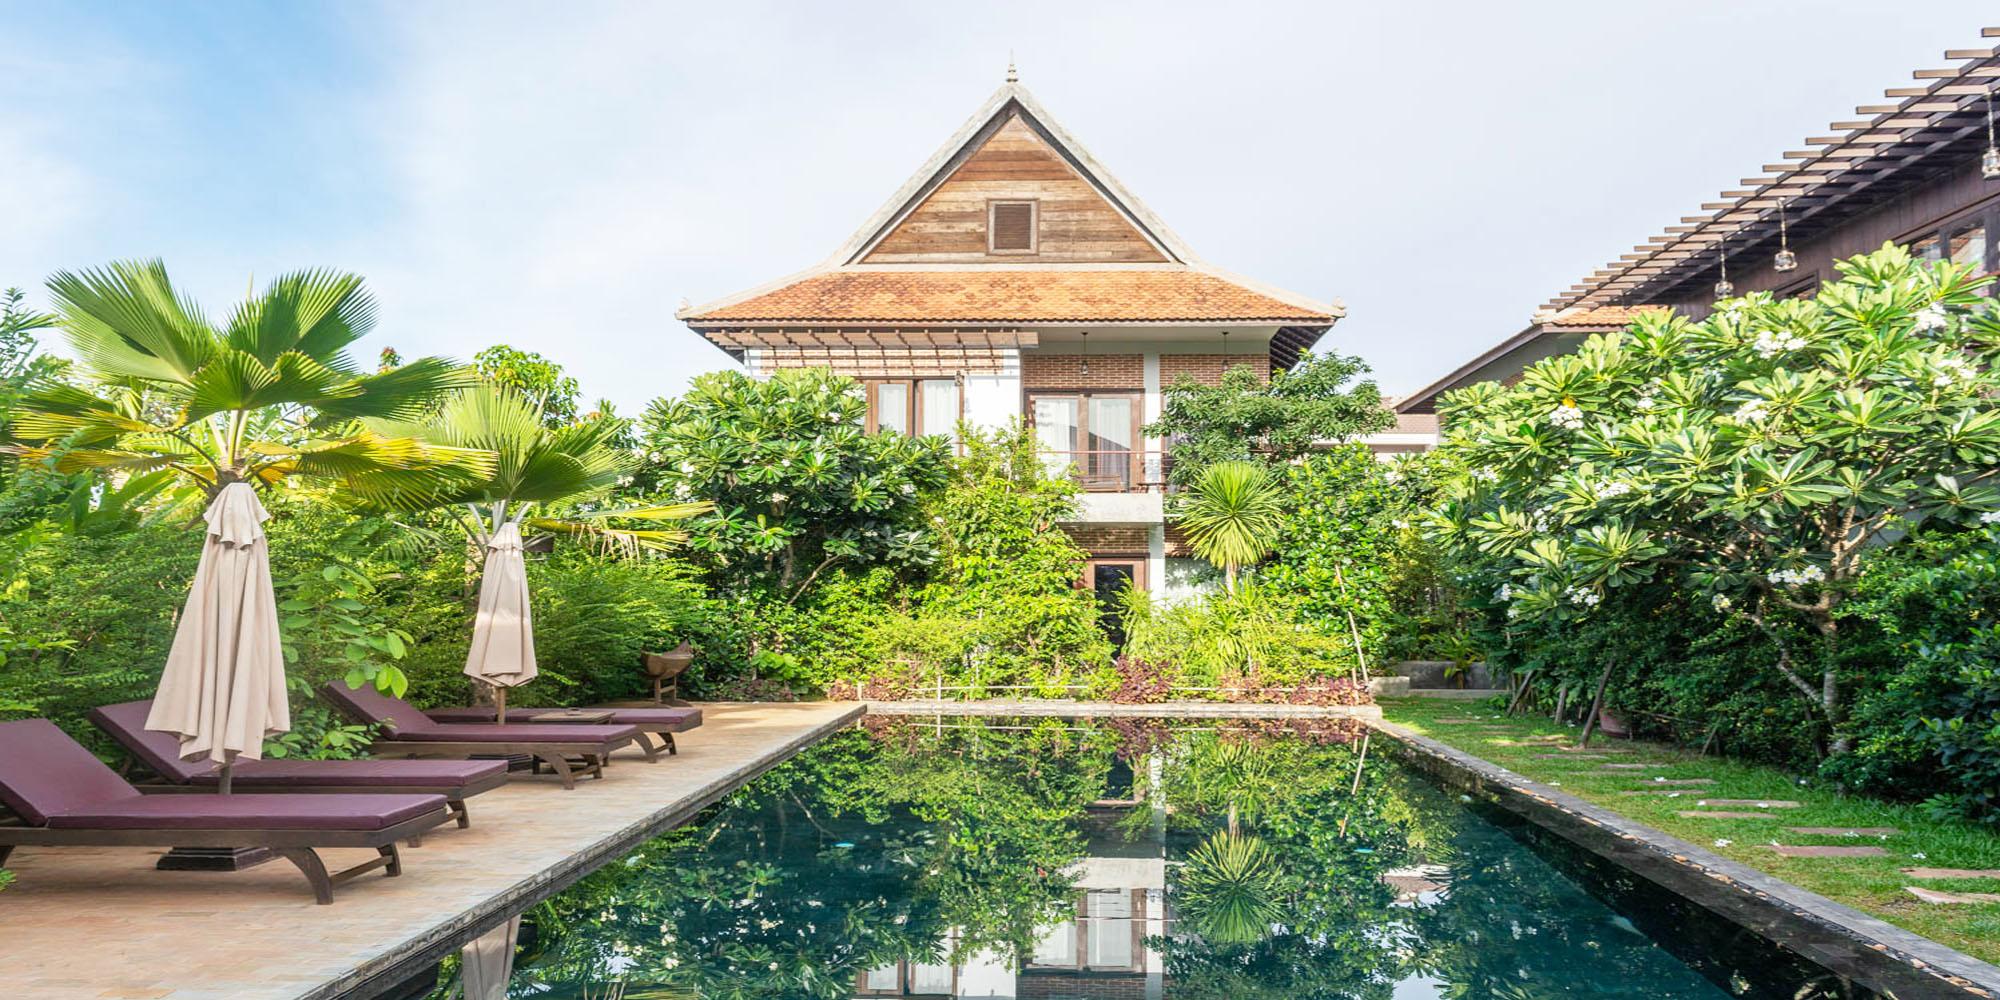 Fabulous and Exquisite Décor 02 – Bedroom Villa for Rent in Siem Reap – Sala Kamreuk [POOL]